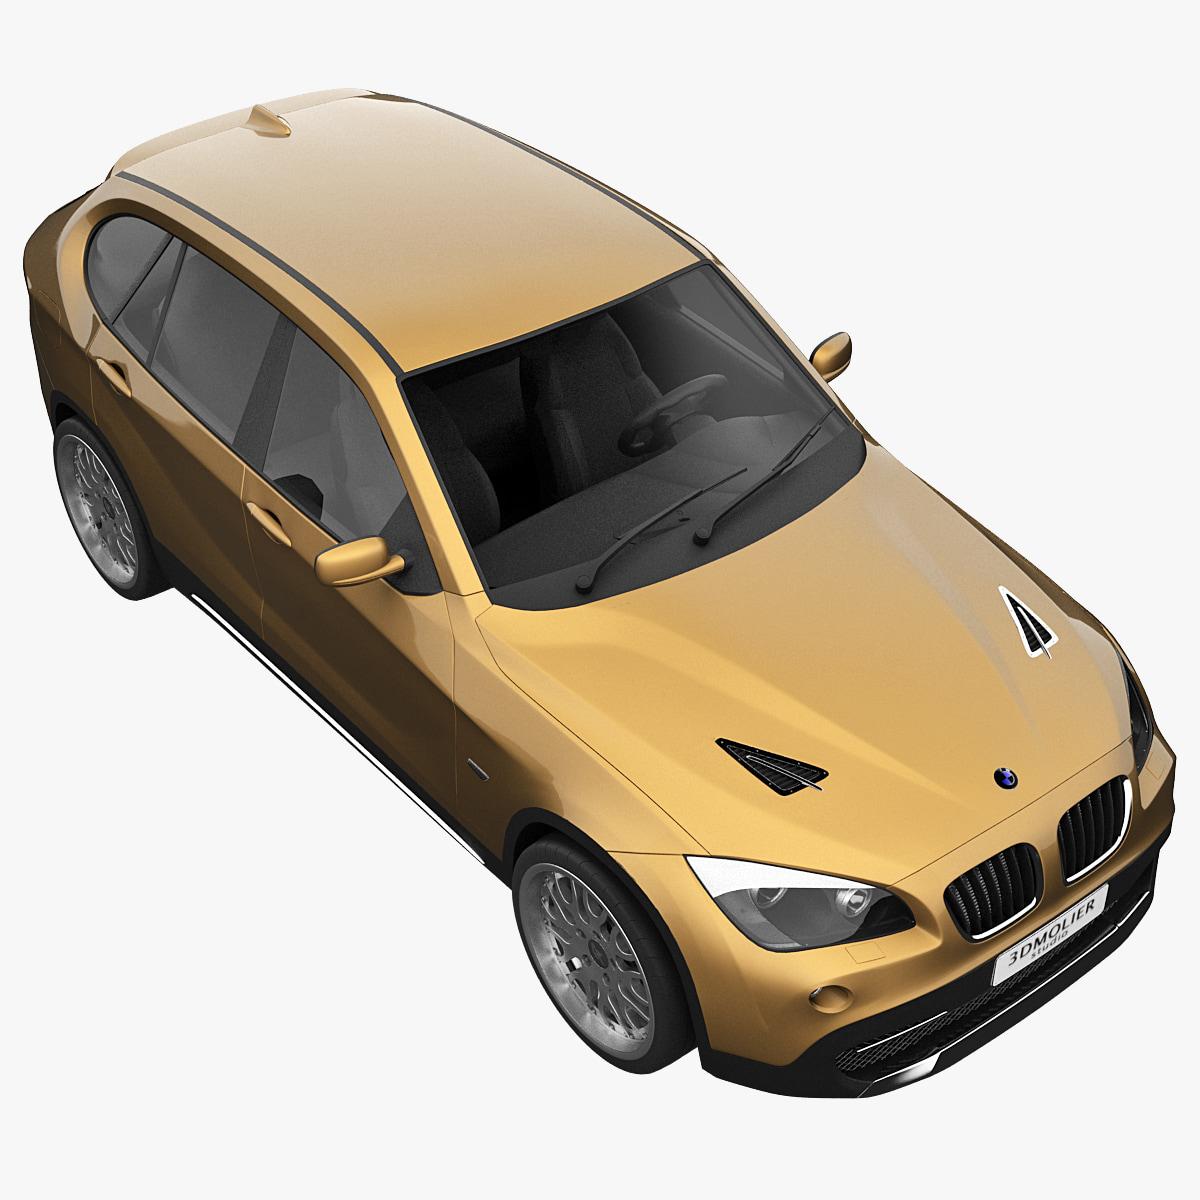 BMW_X1_E84_0002.jpg